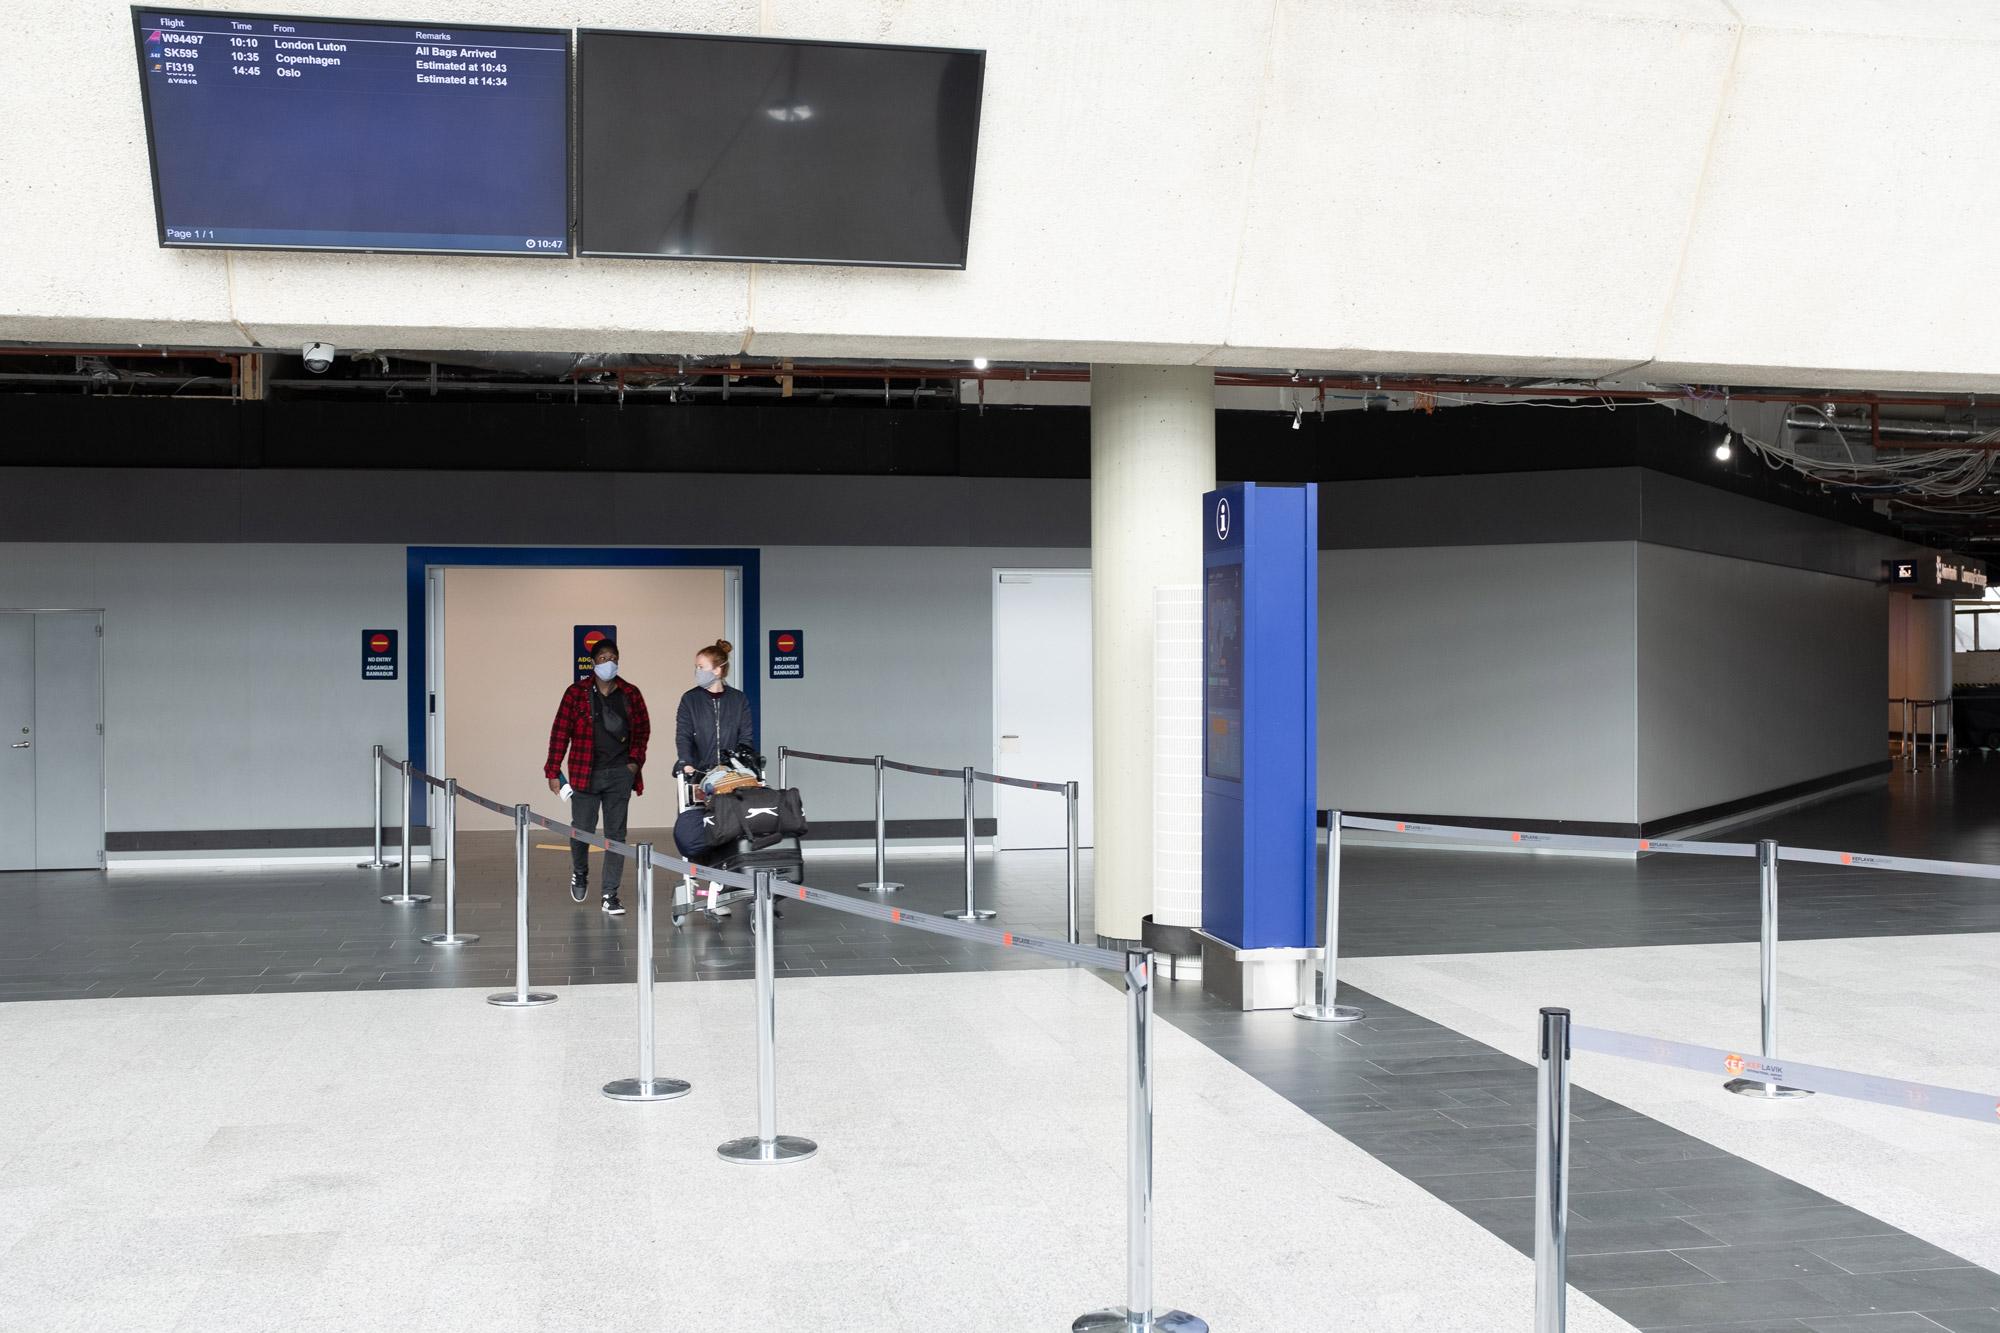 Passengers walk through Keflavík International Airport in Reykjanesbær, Iceland, on June 15.